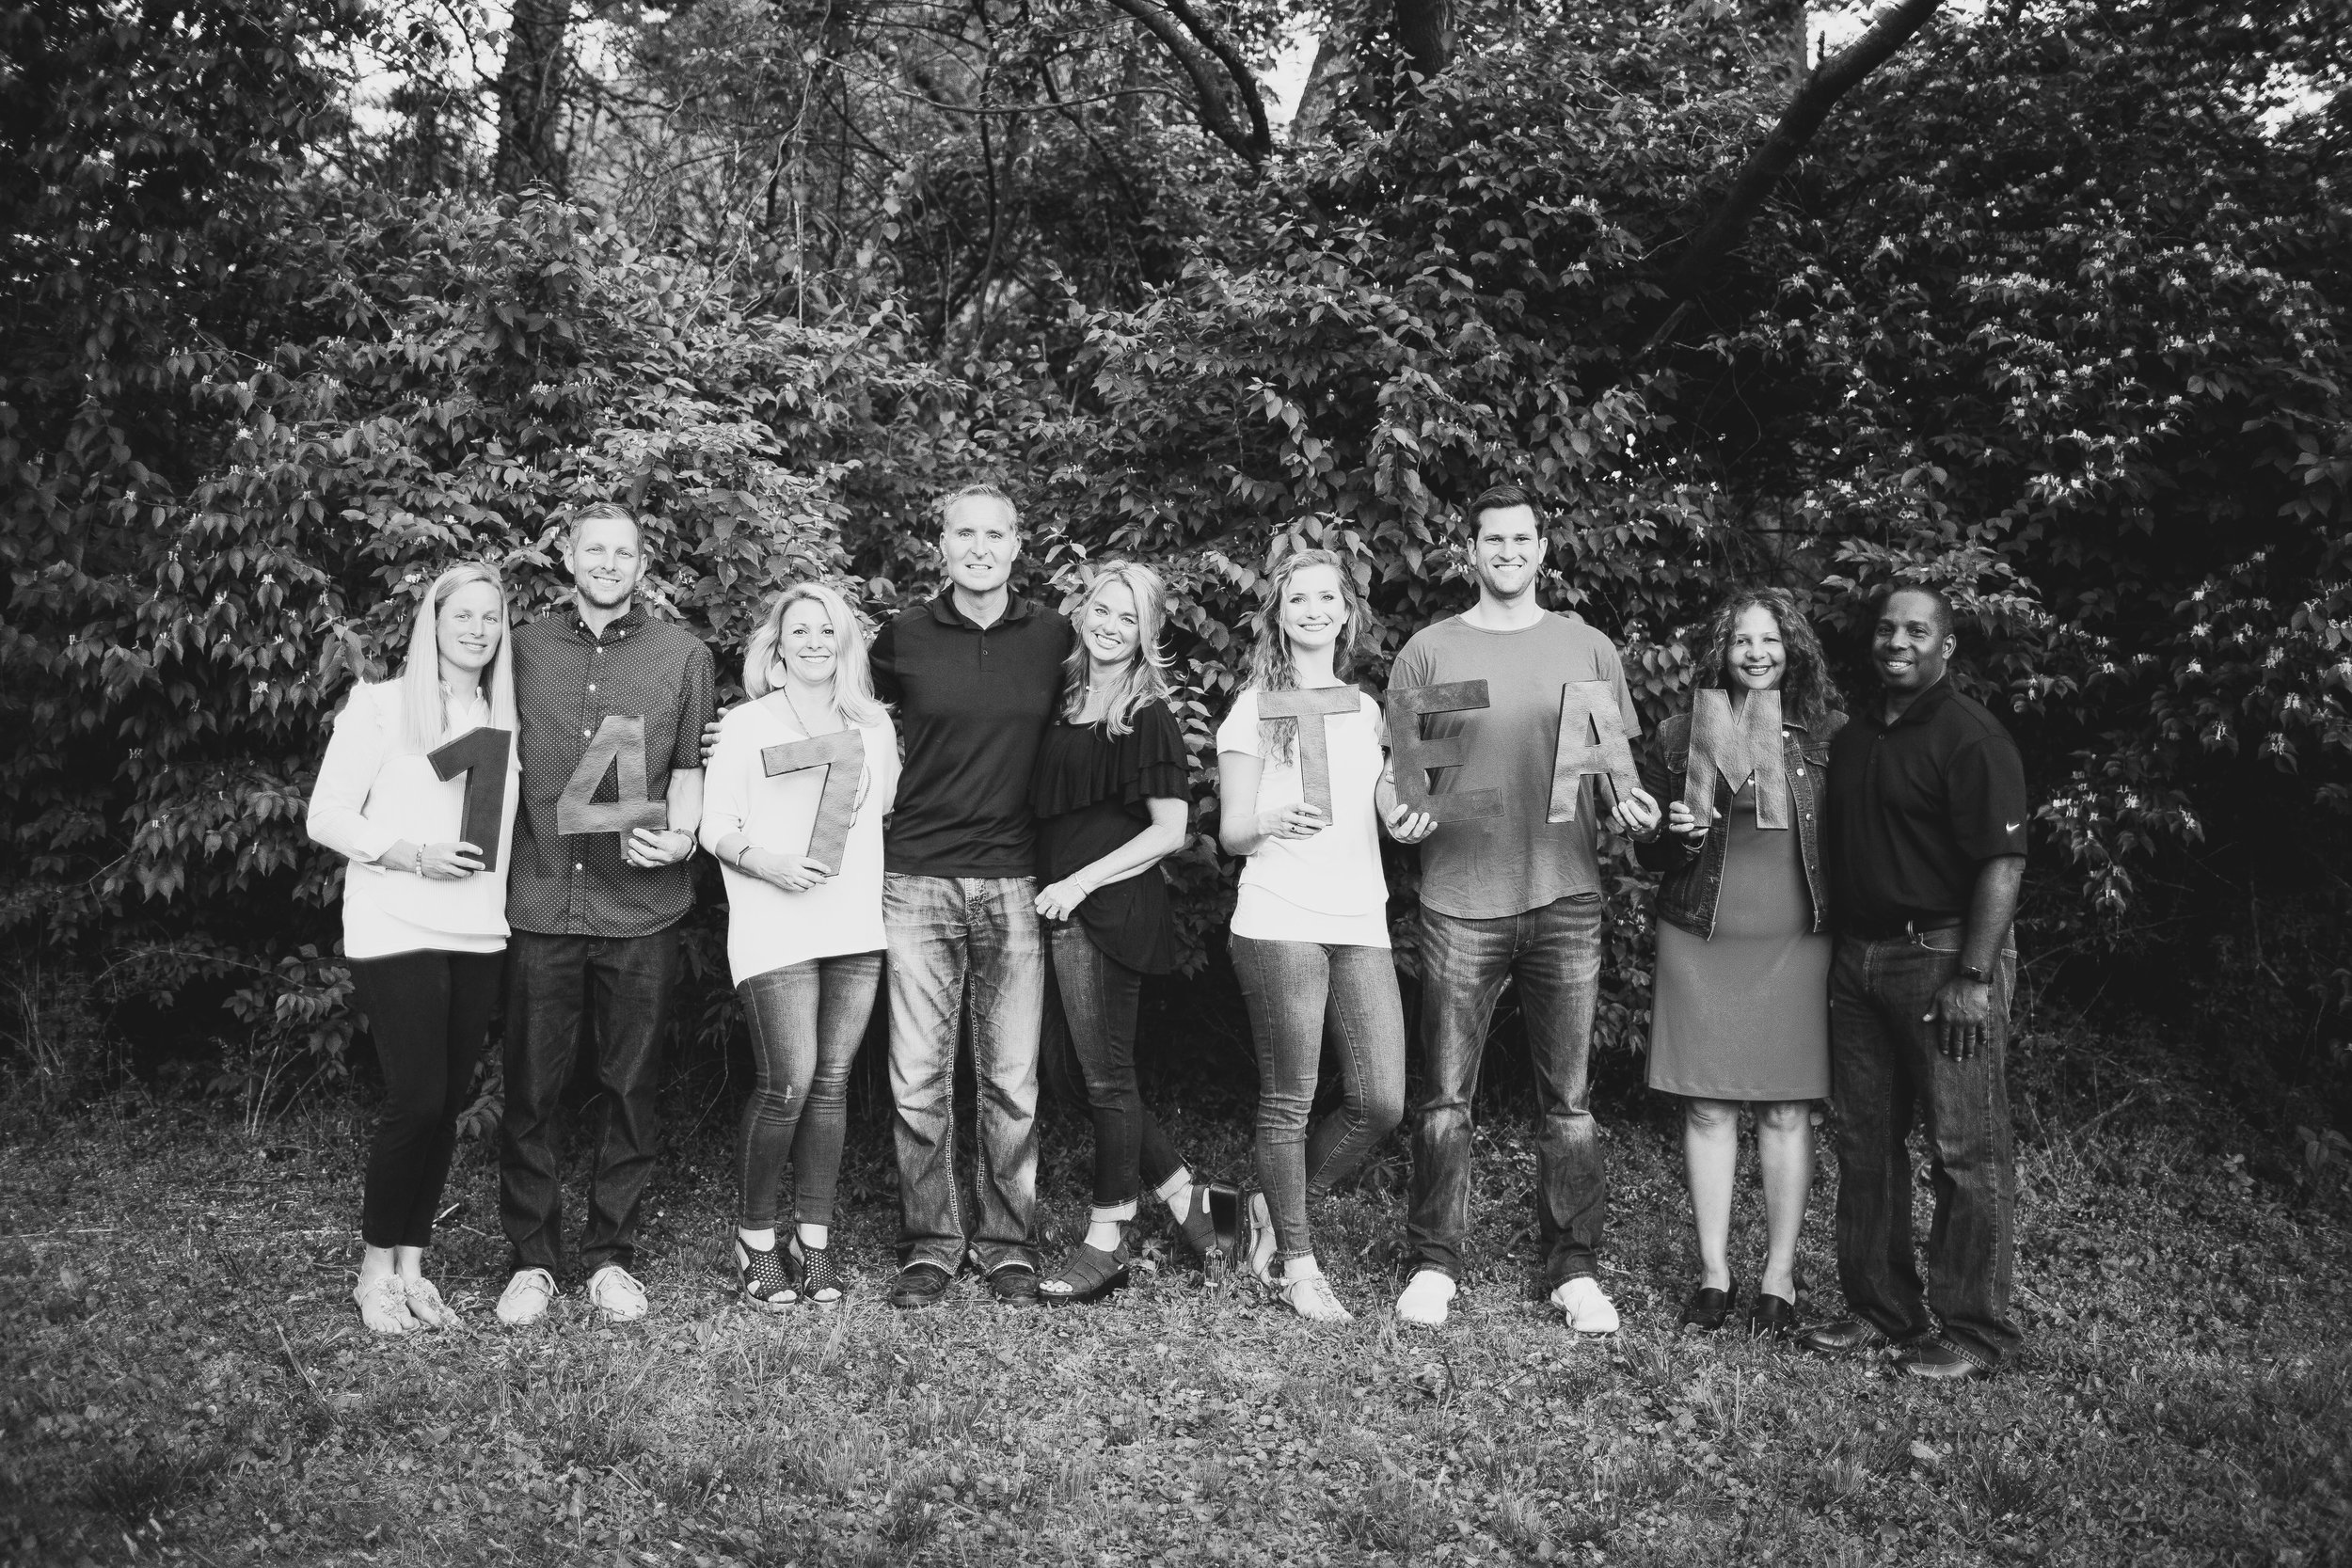 Board Members:  Carlee Brian, Chris Brian, Brandi Felts, Scott Oatsvall, Gwen Oatsvall, Anna Beasley, Perry Beasley, Robin Sims, Dean Sims